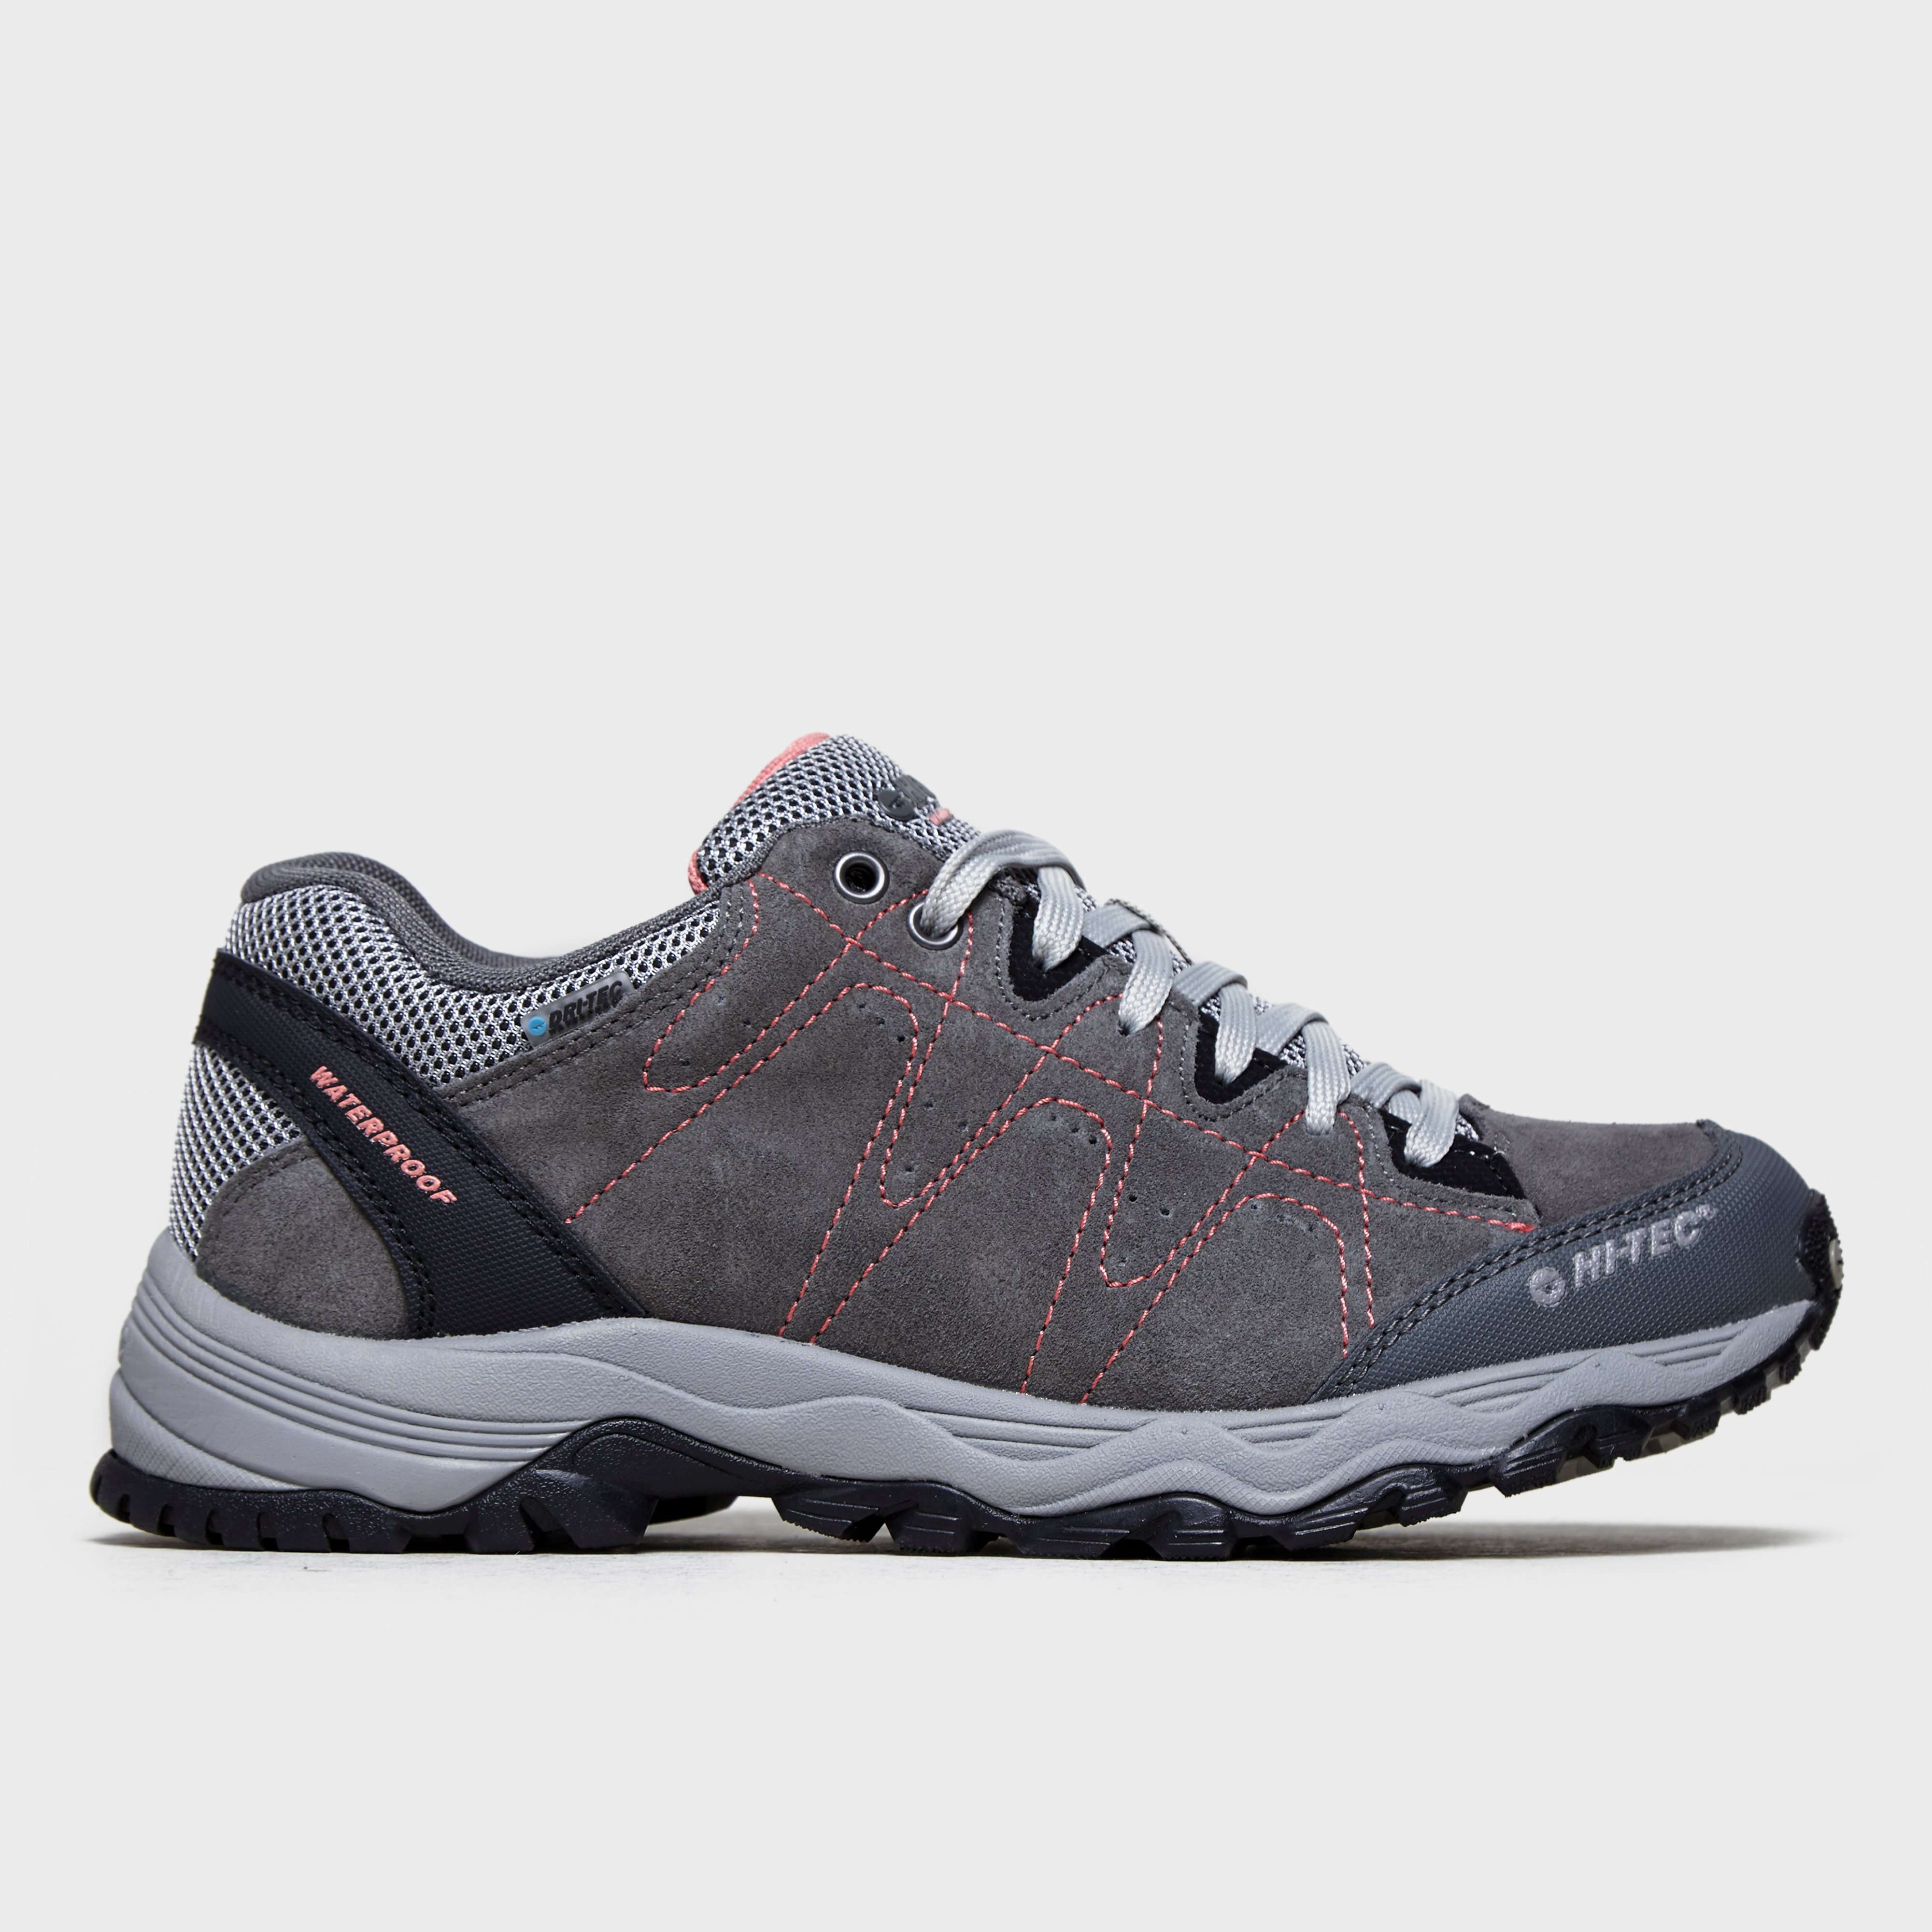 HI TEC Women's Libero II Waterproof Multi-Sport Shoe